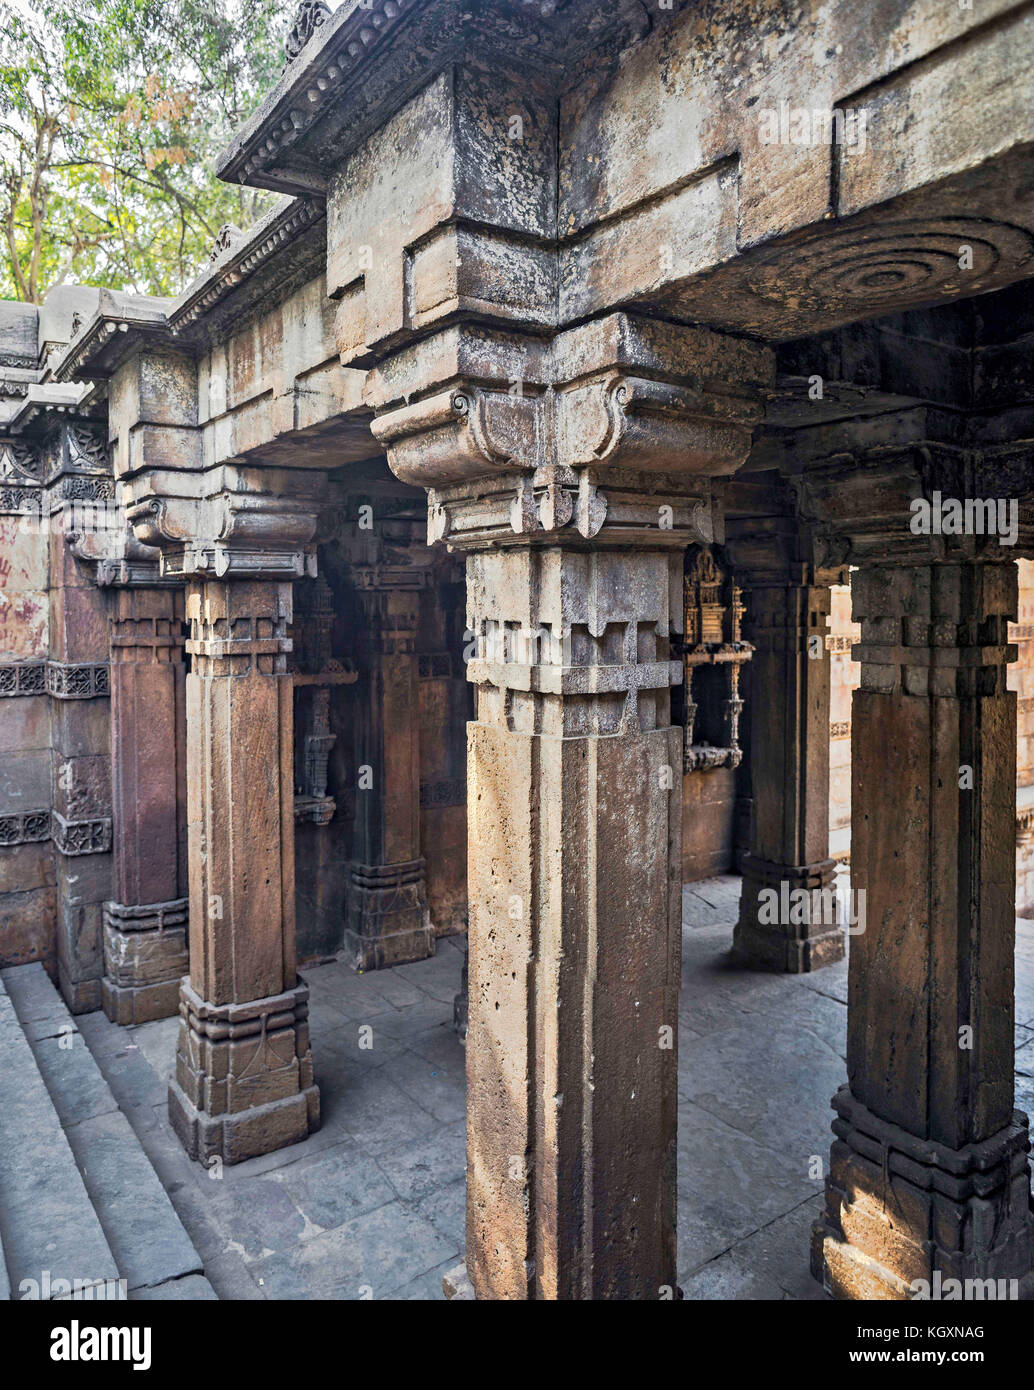 L'étape de harir dada bien, Ahmedabad, Gujarat, Inde, Asie Photo Stock